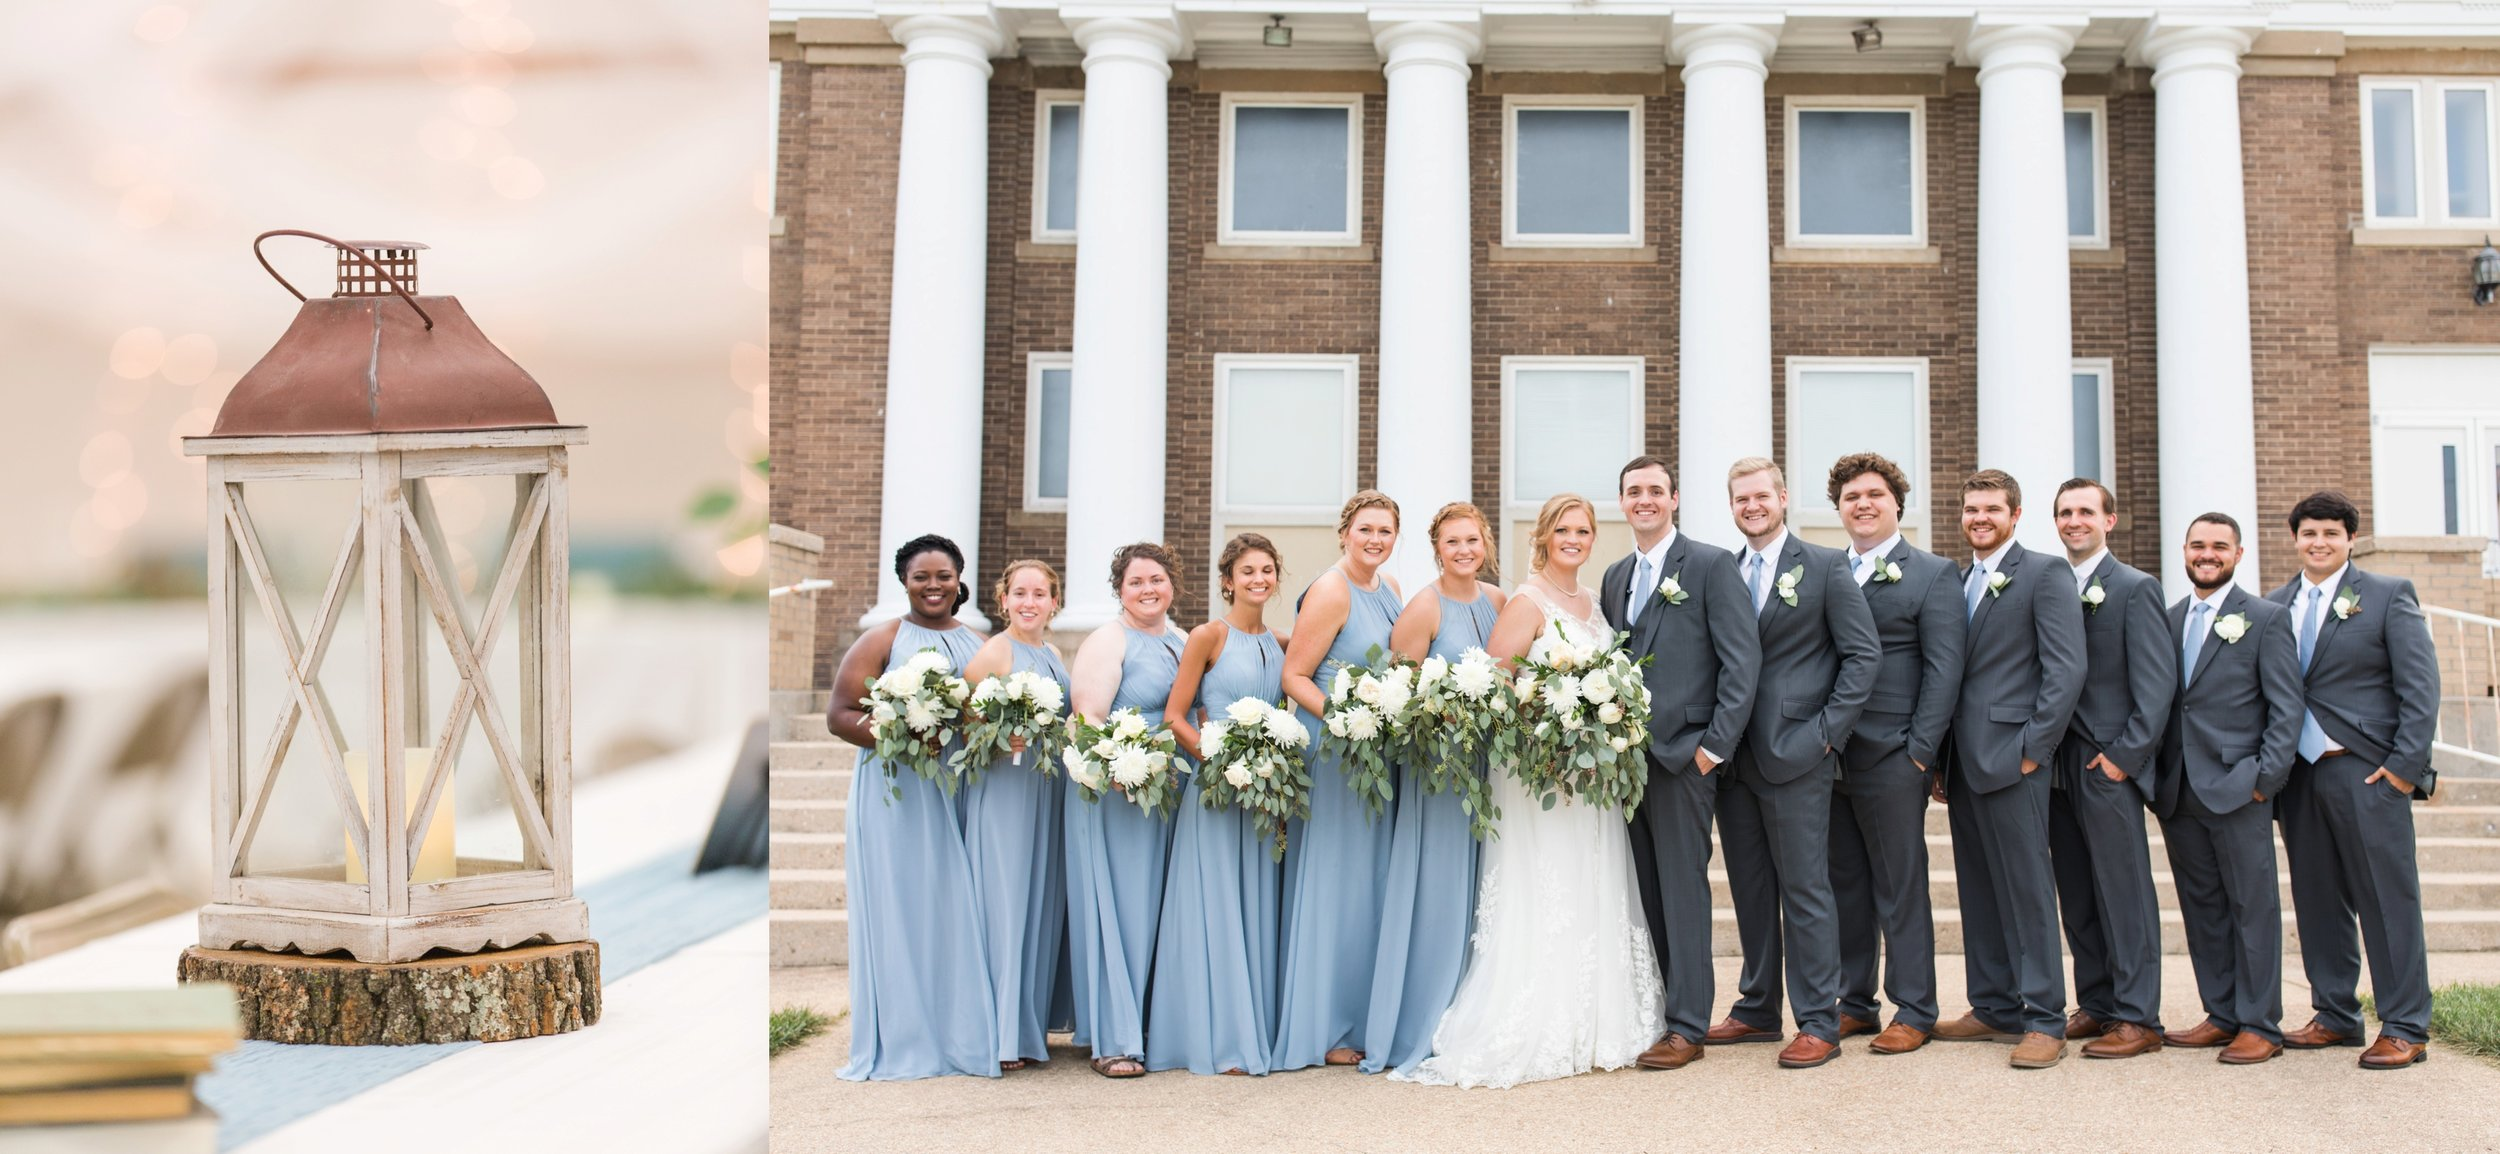 DIY Weddings Dusy Blue Jessica McBroom Photography